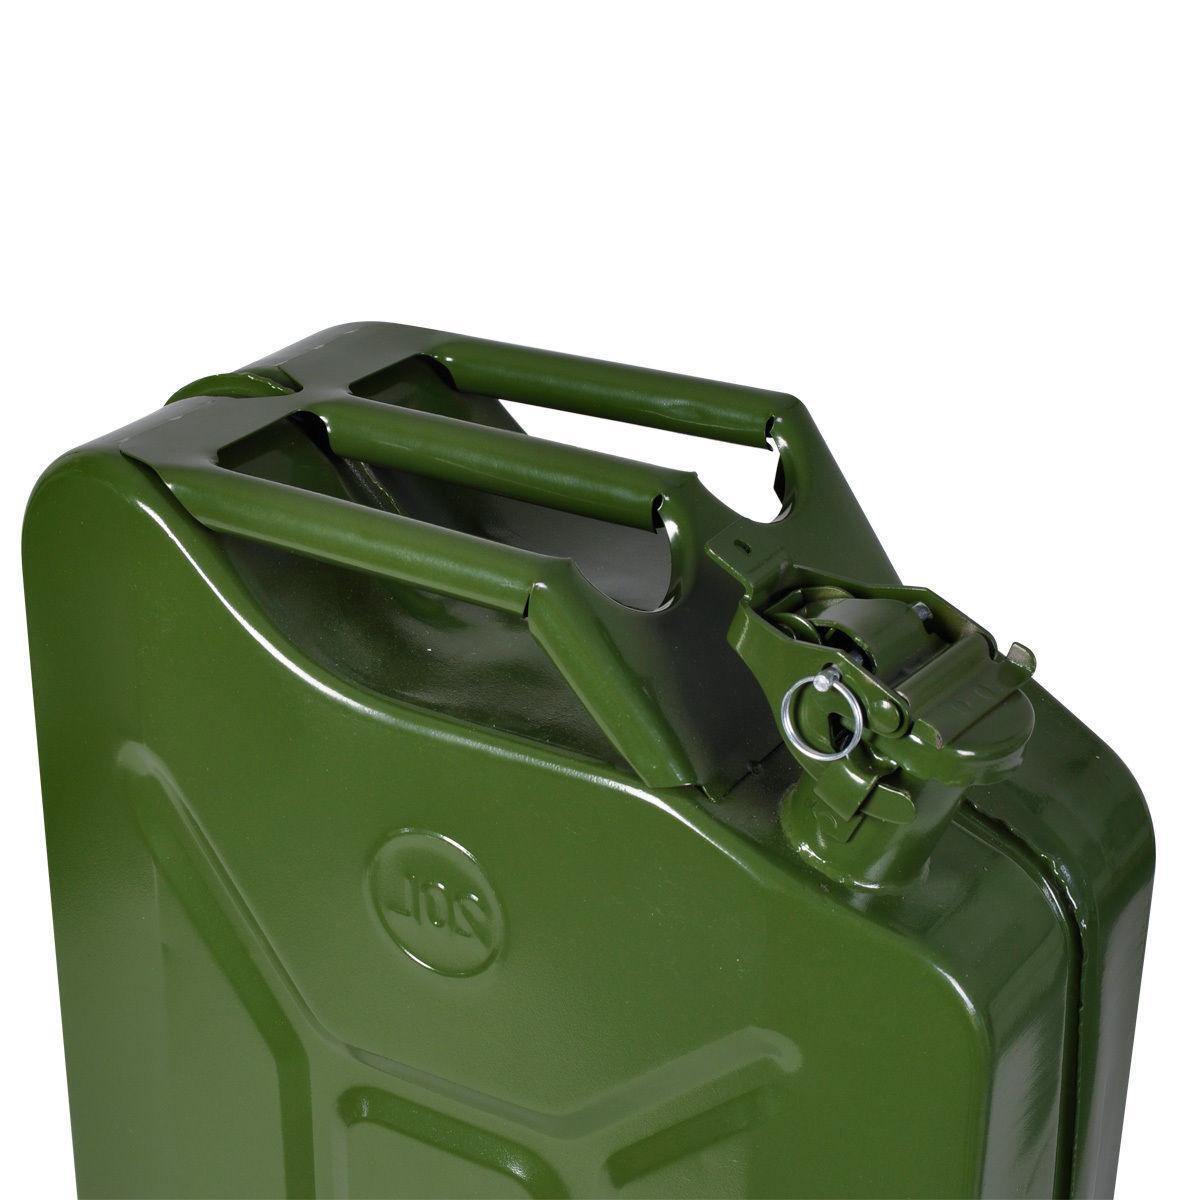 Jerry 5 20L Steel Tank Backup Military